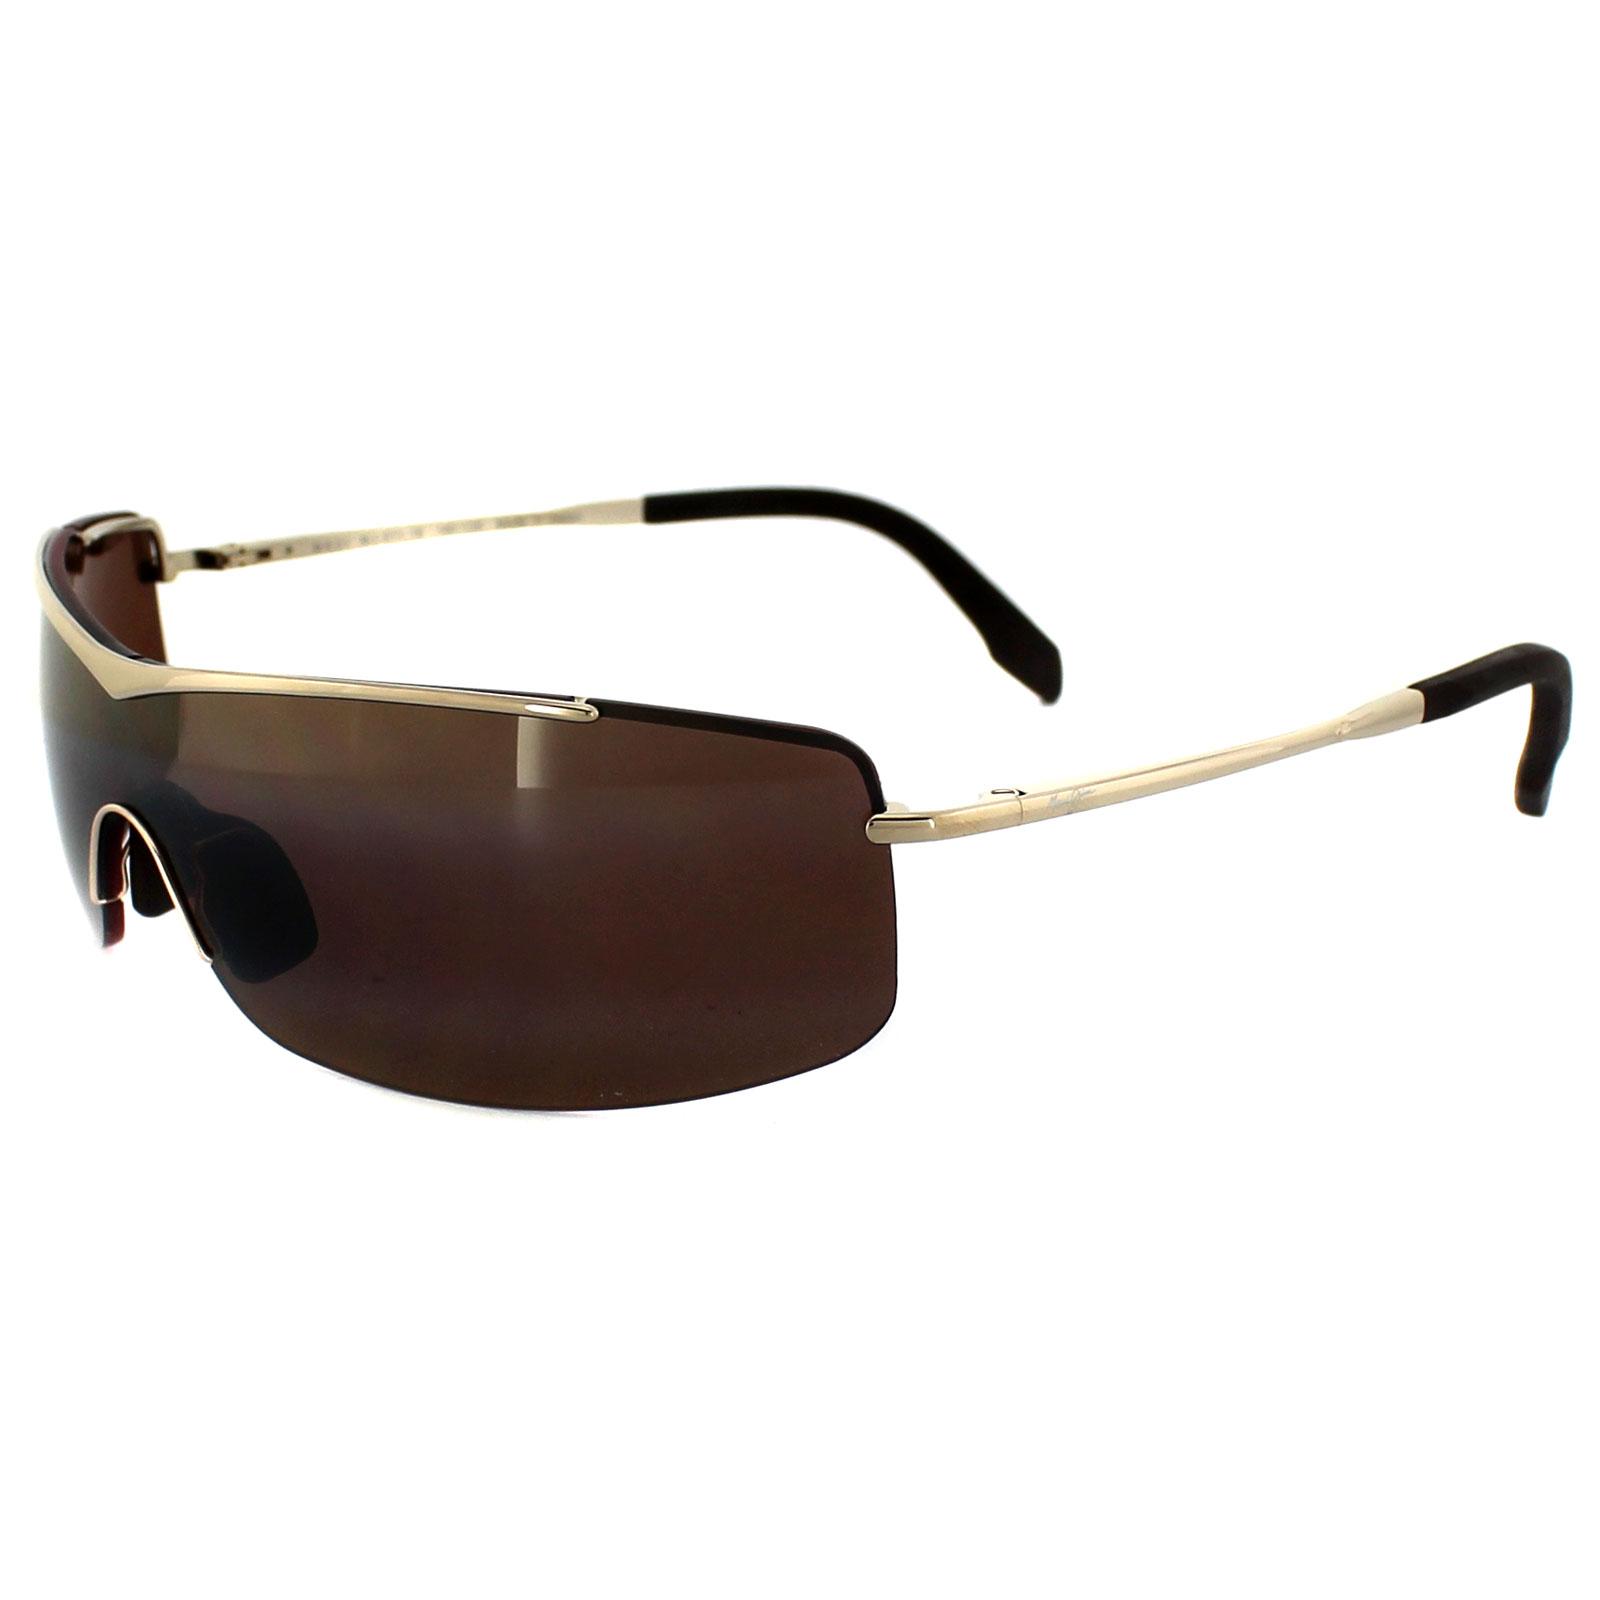 86dc29e8076 Cheap Maui Jim Sandbar Sunglasses - Discounted Sunglasses